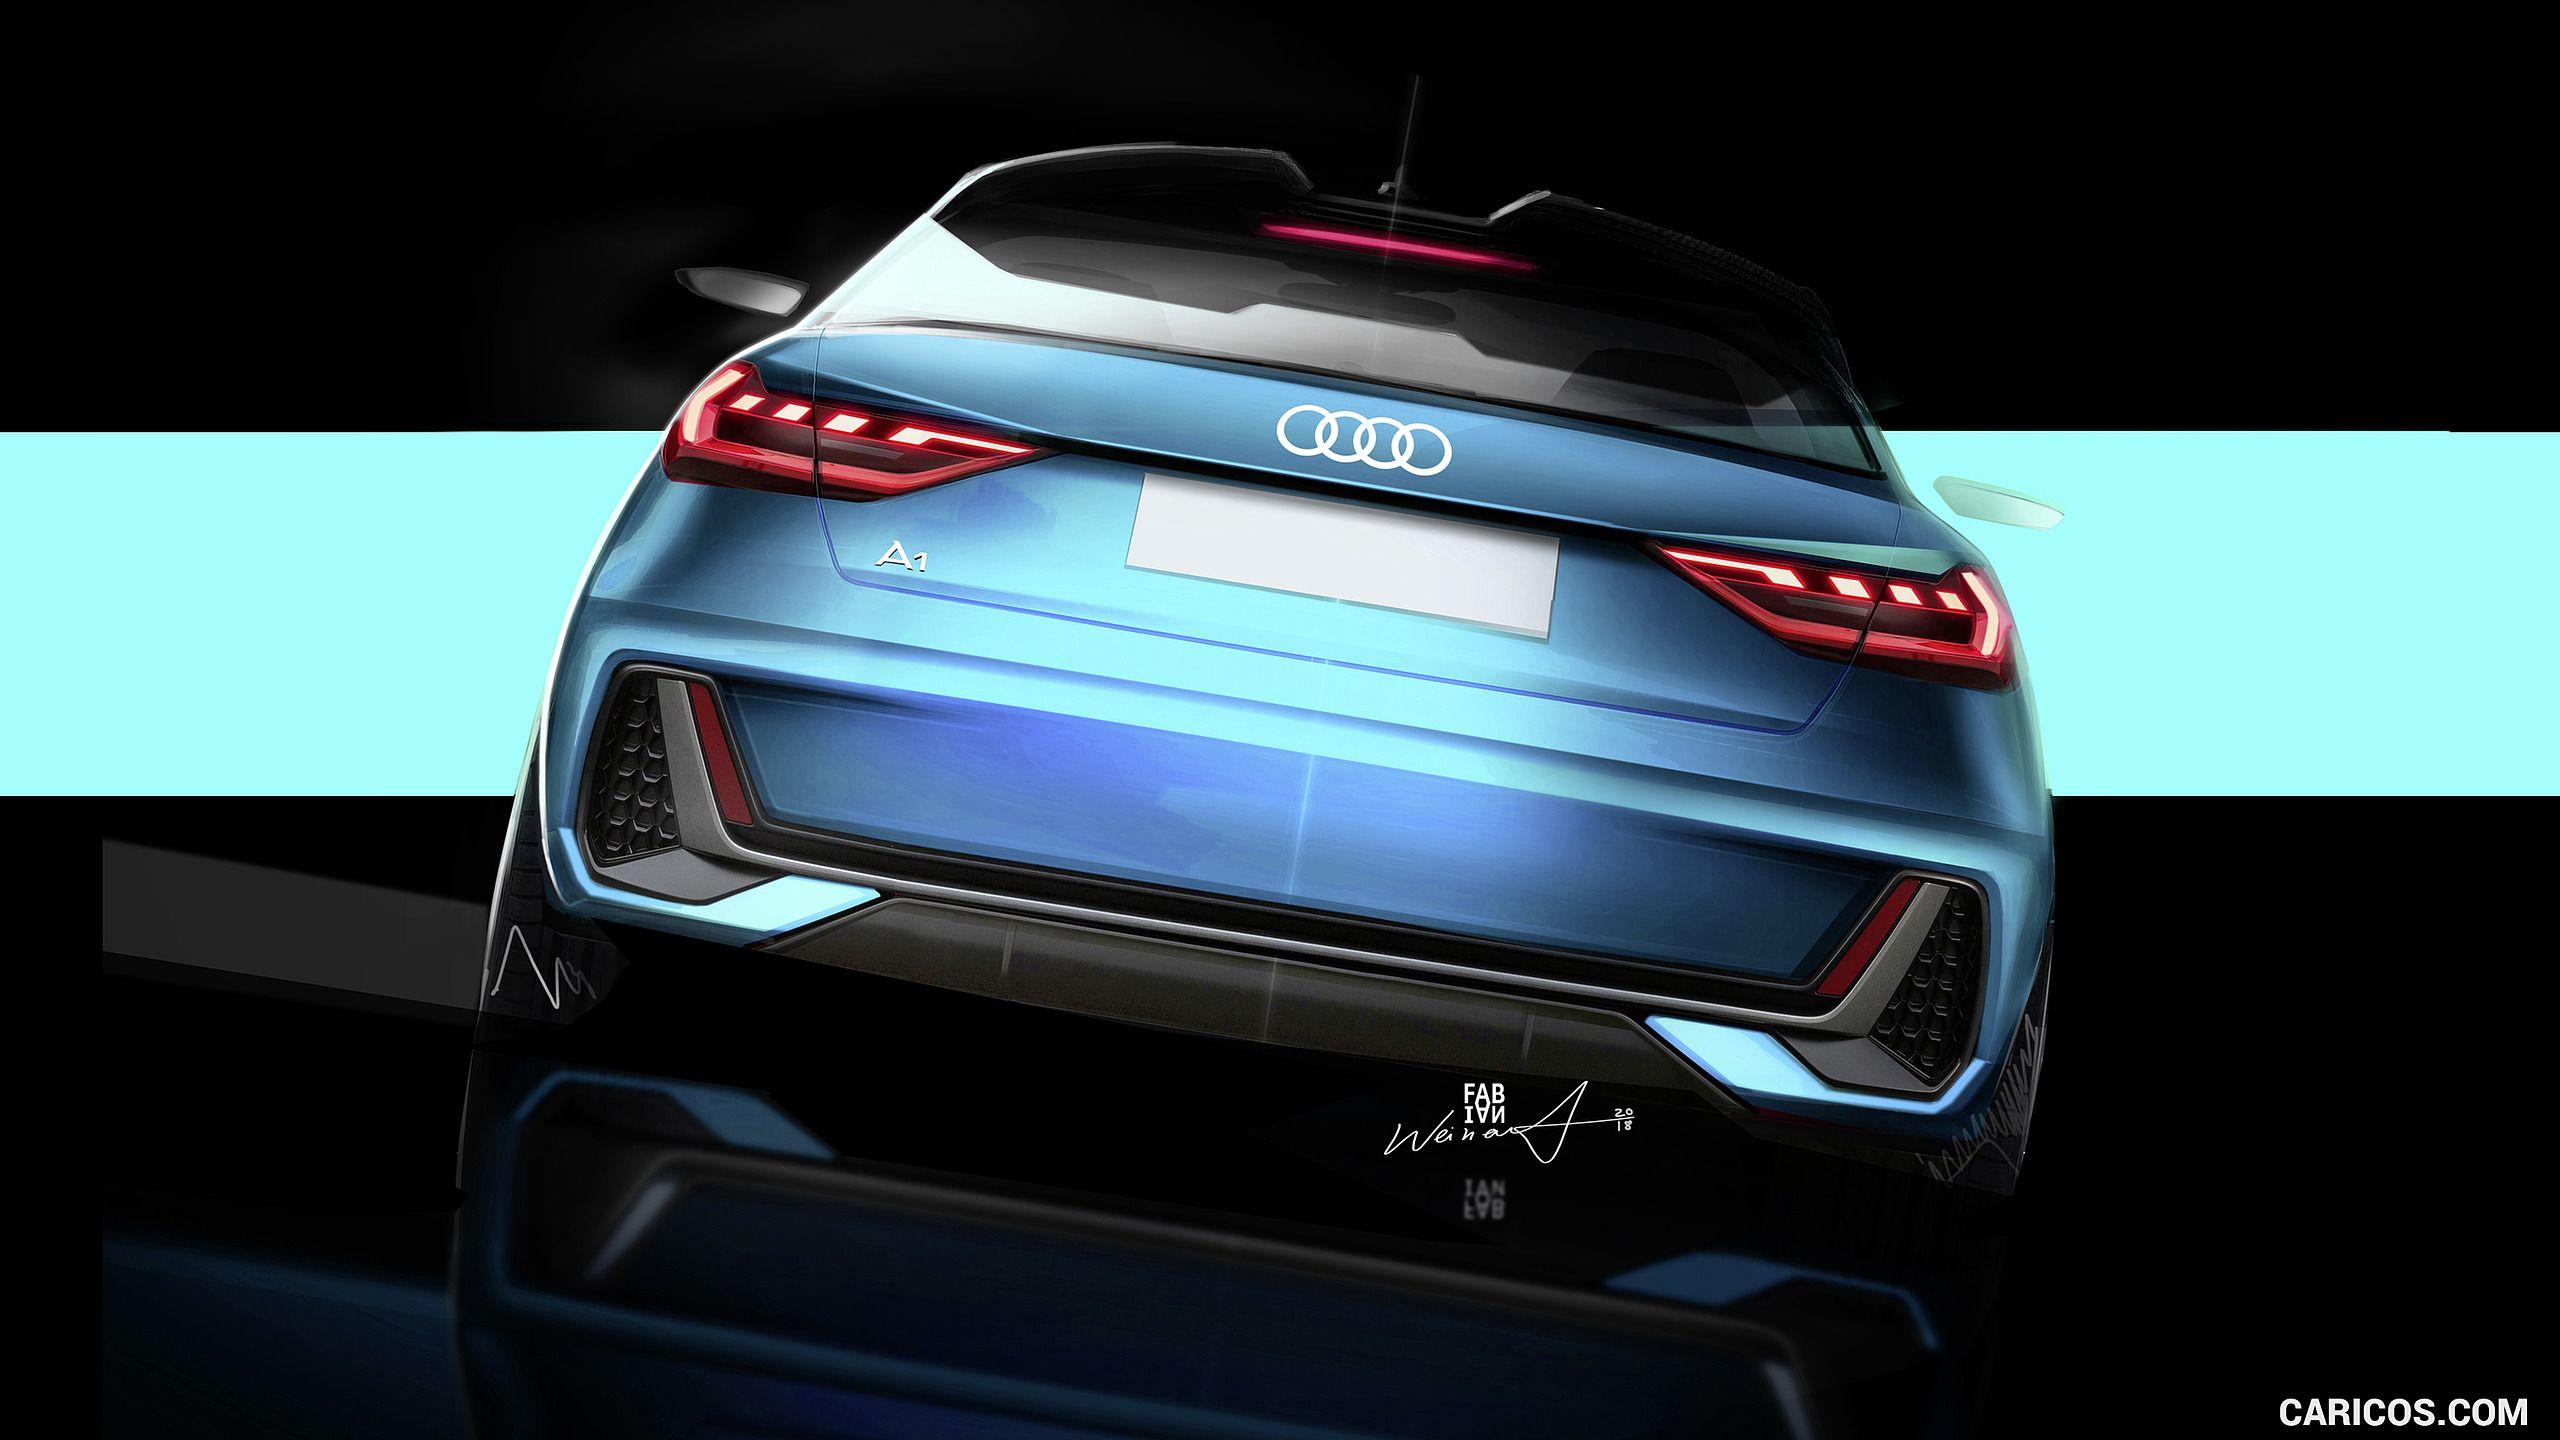 2019 Audi A1 Sportback Wallpaper Audi A1 Audi A1 Sportback Audi